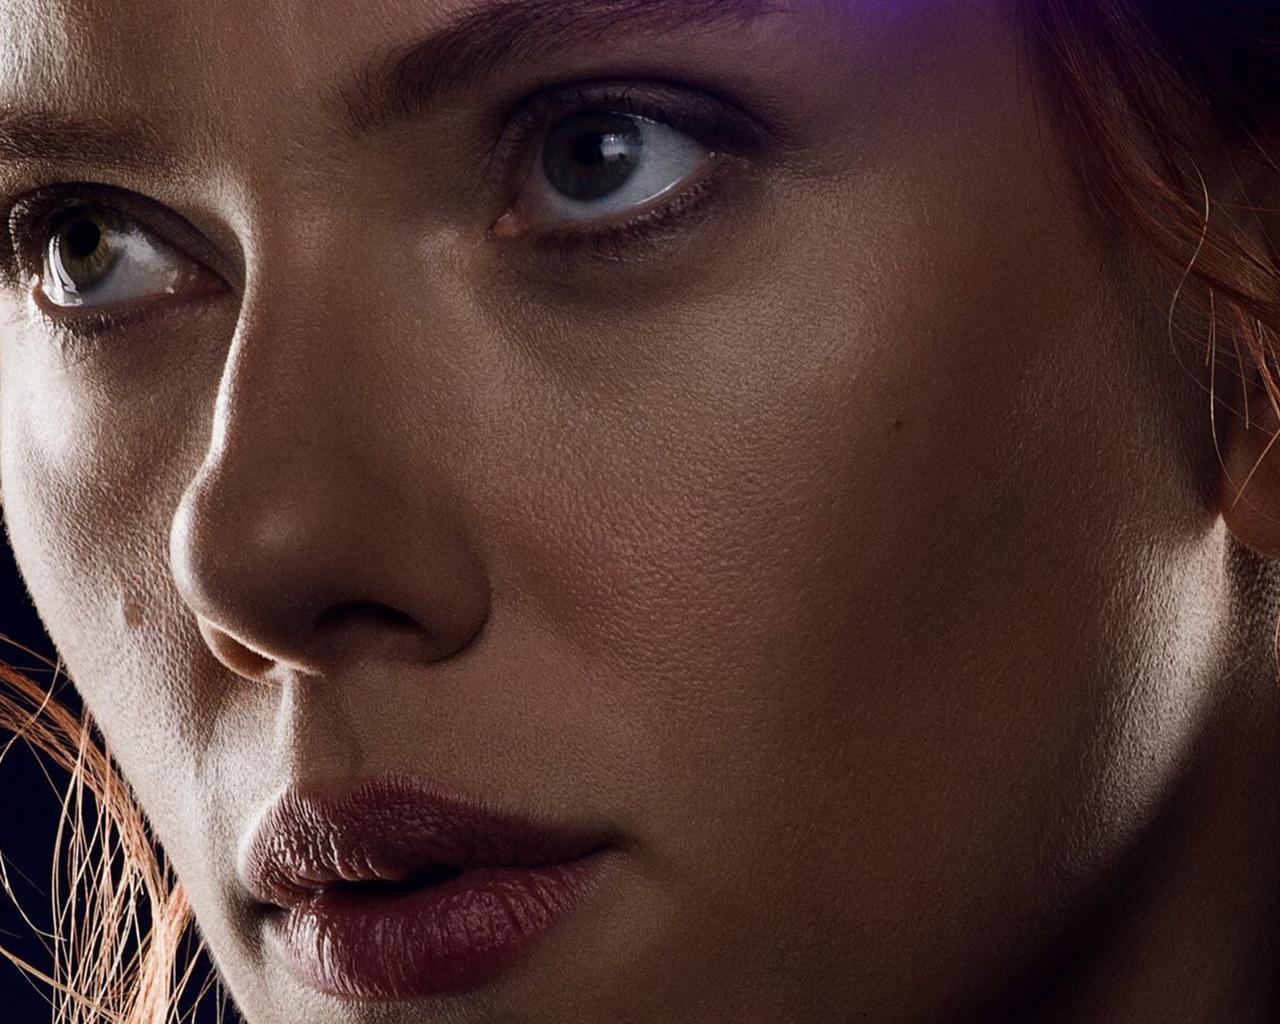 Scarlett johansson black widow poster - photo#44